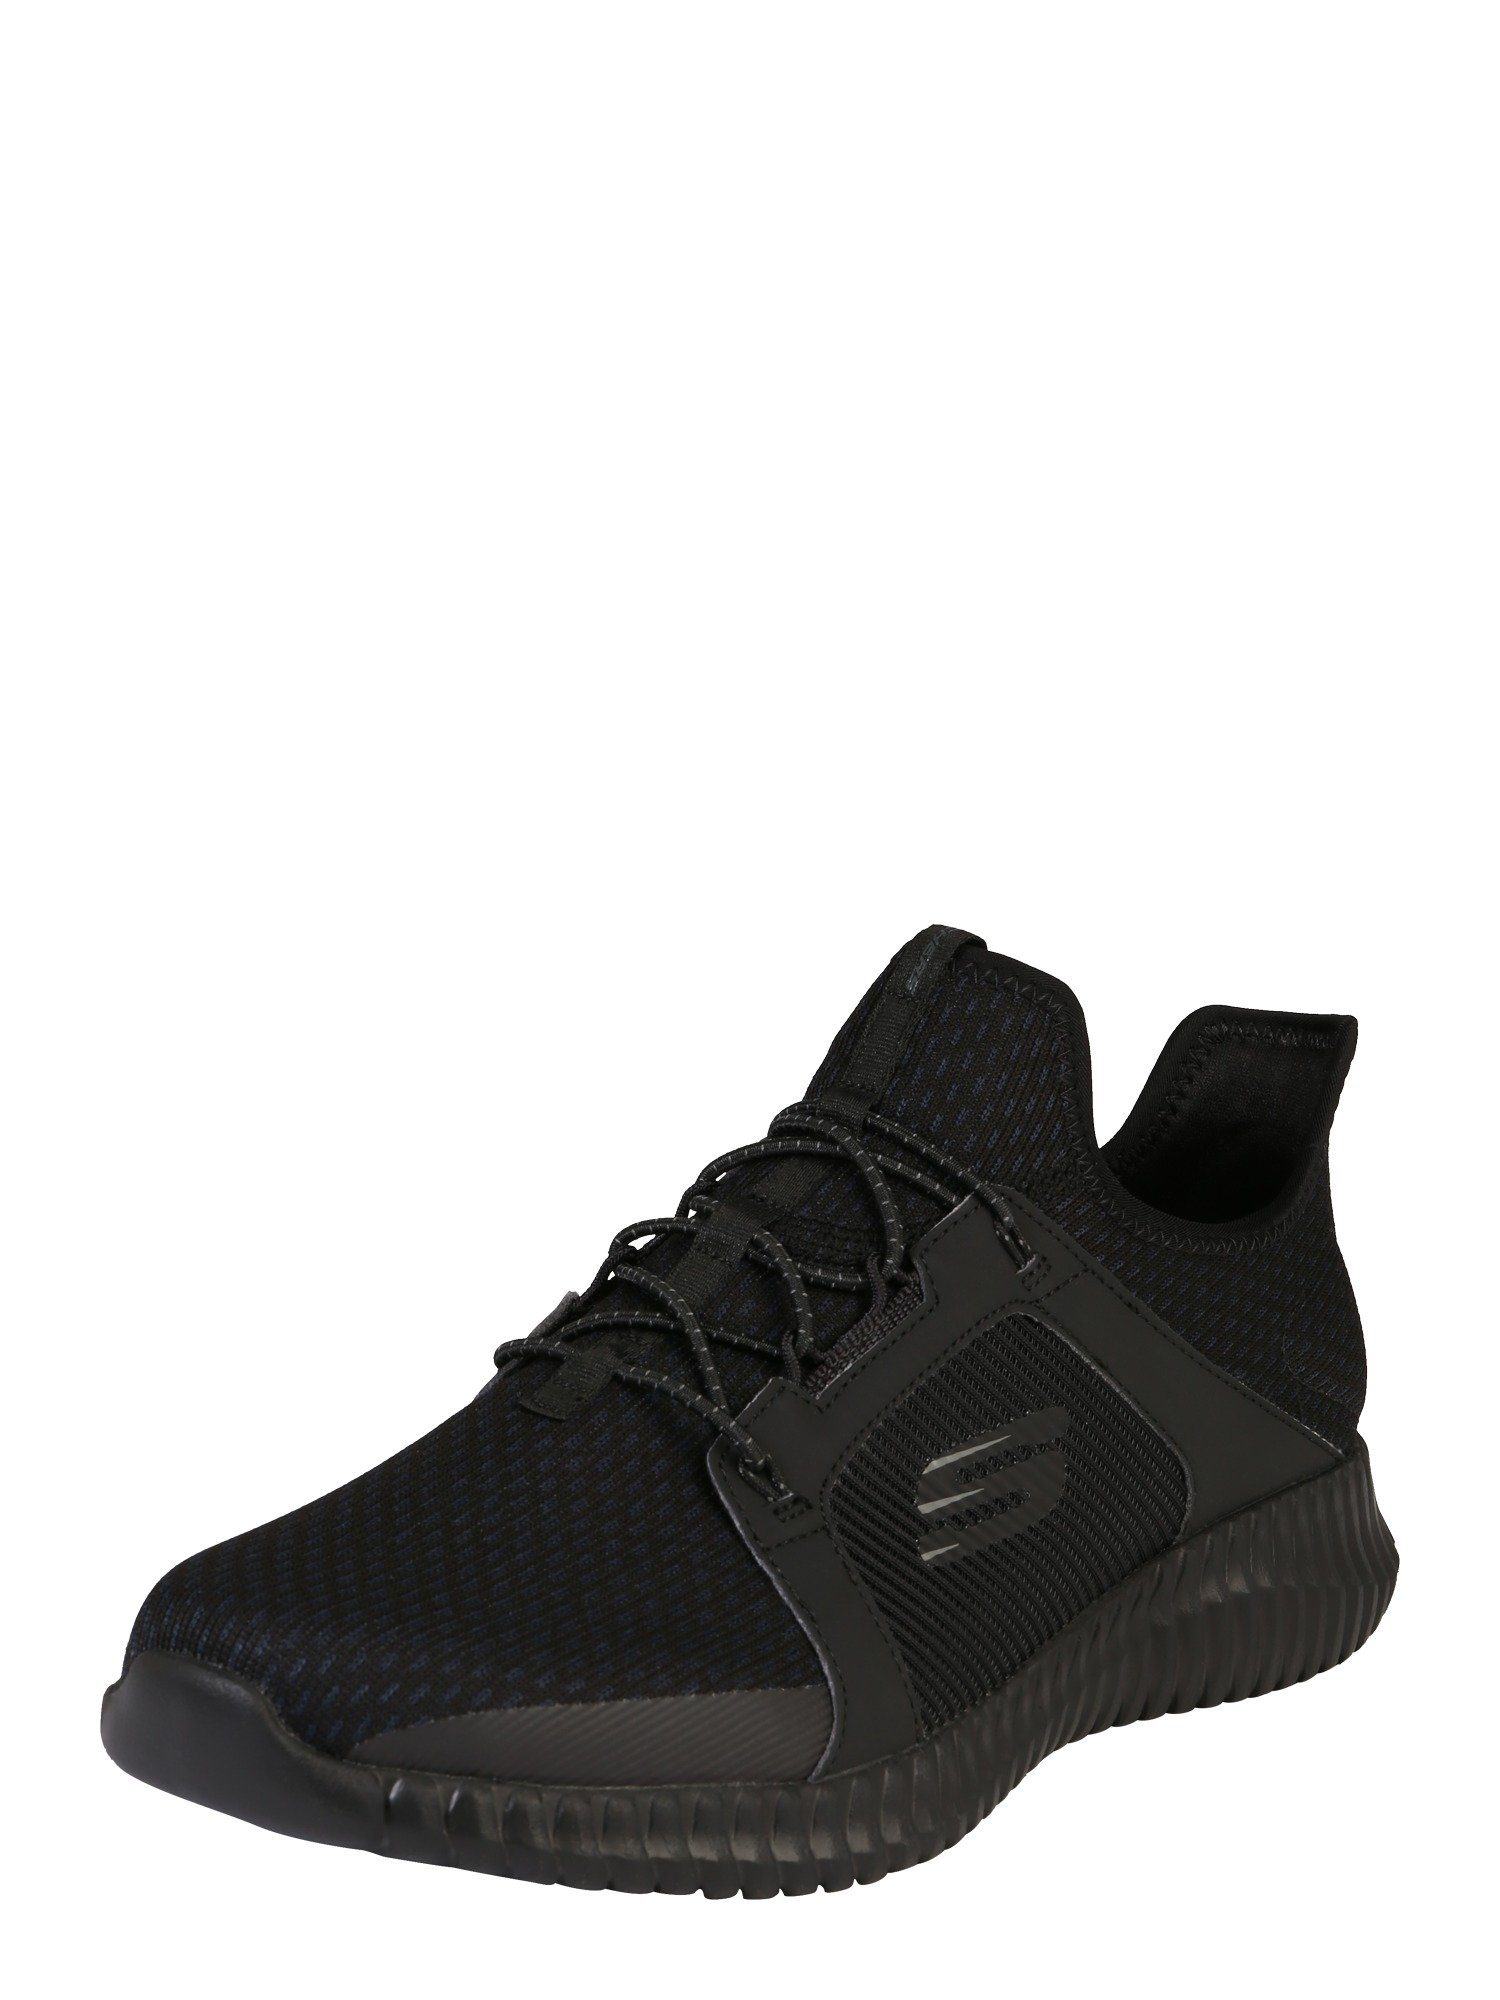 Skechers ELITE FLEX Sneaker online kaufen  schwarz